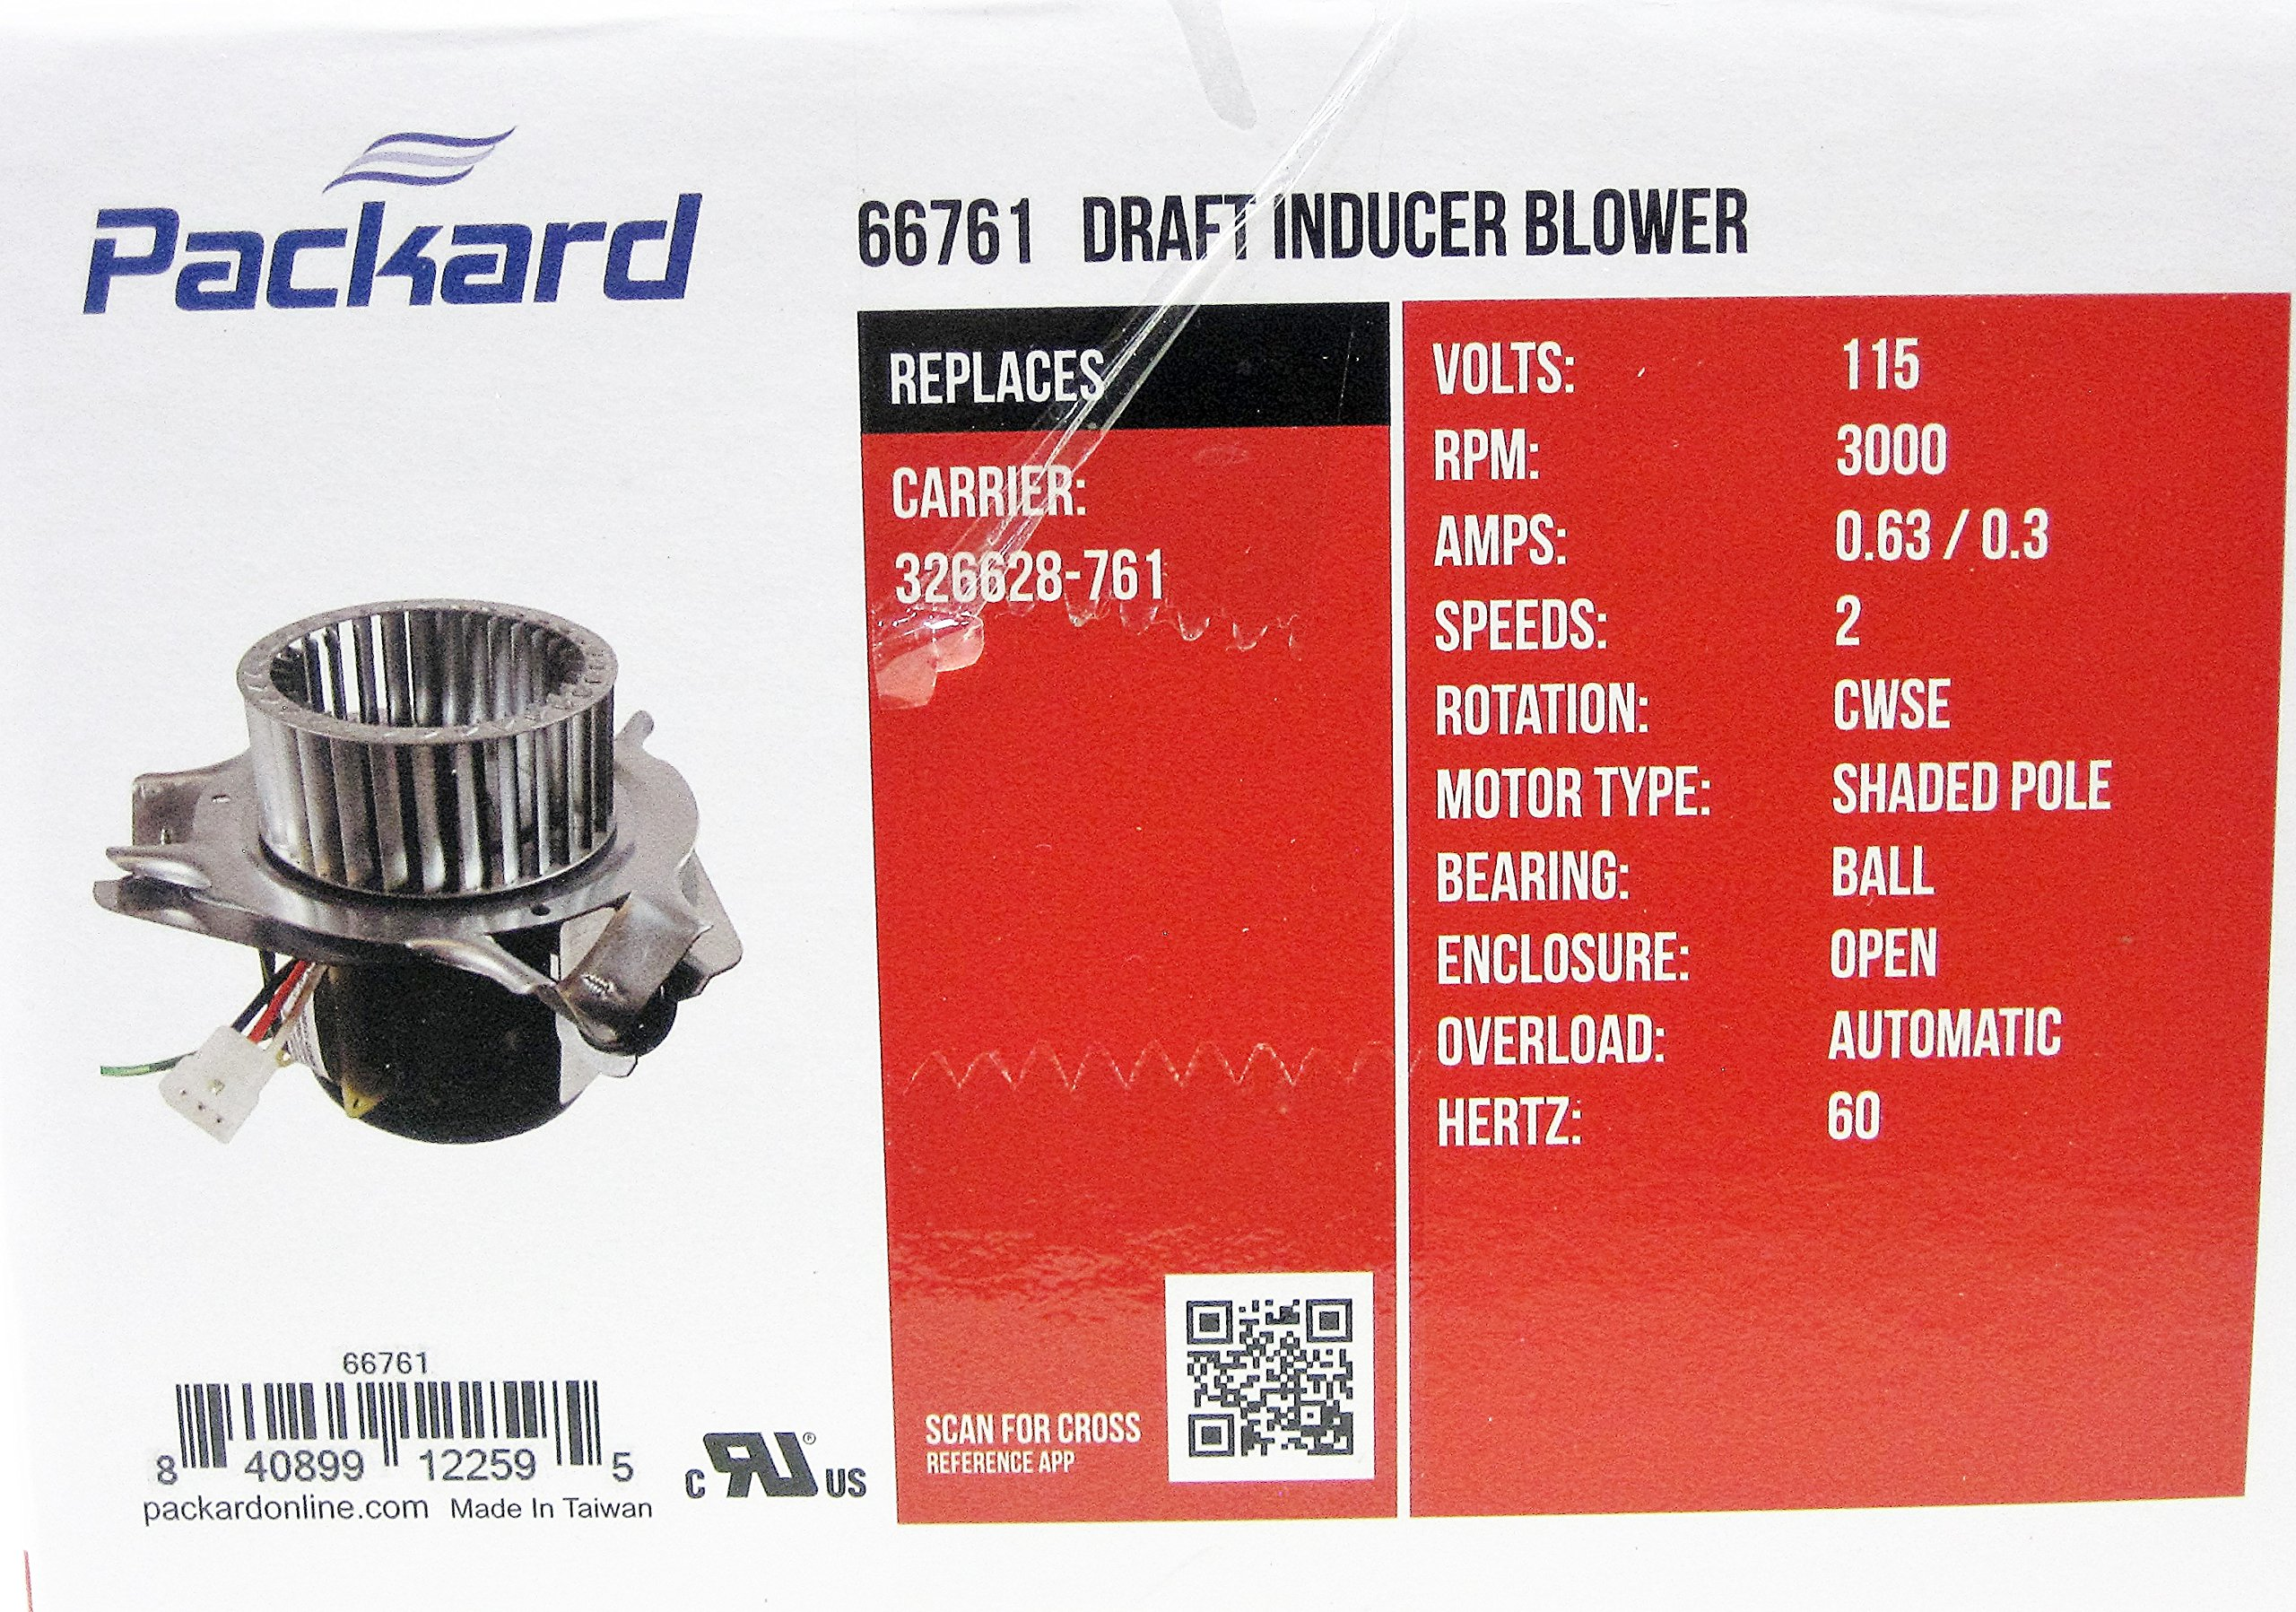 Packard Draft InDucer Fan Furnace Blower Motor for Carrier 326628-761 by Packard